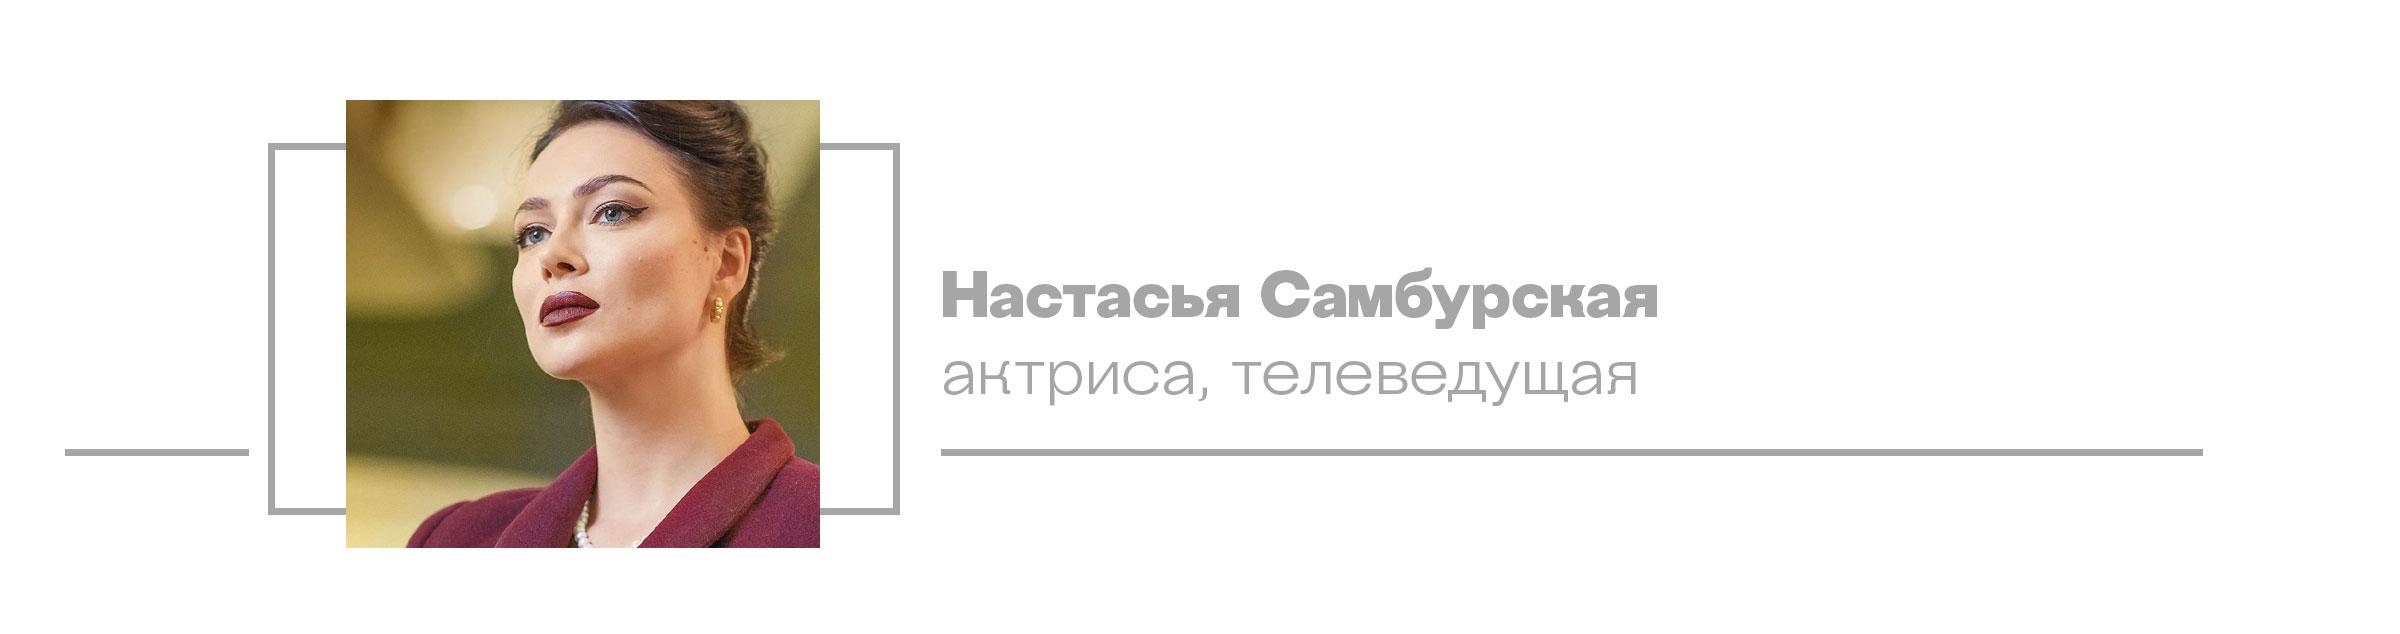 Настасья Самбурская, актриса, телеведущая